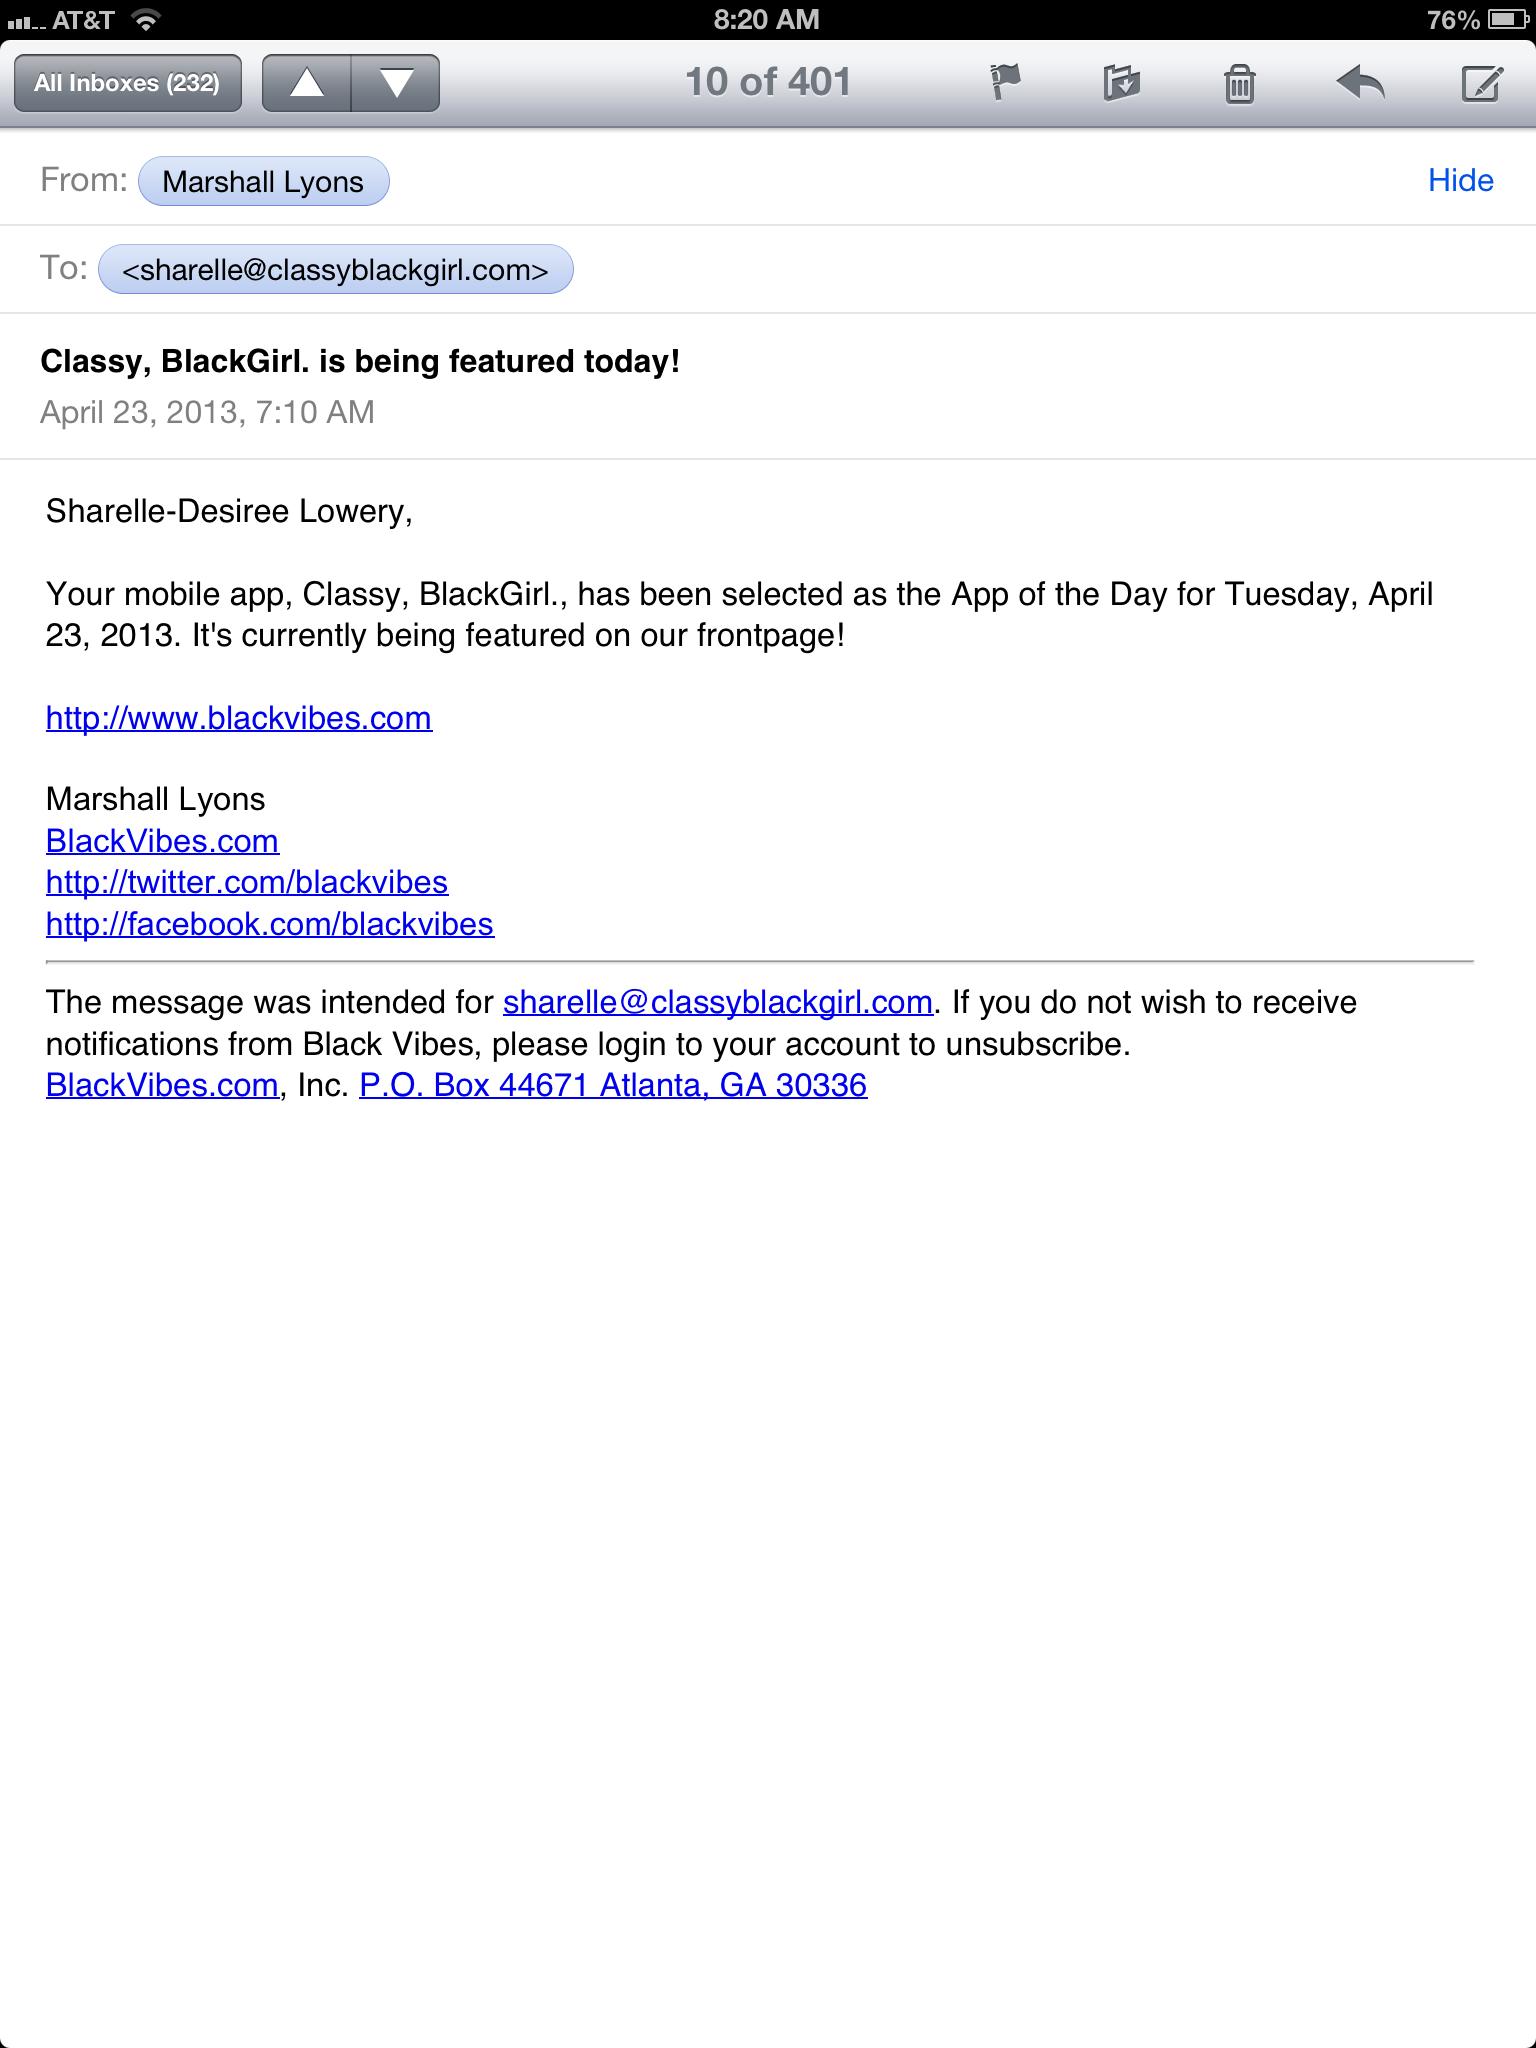 classy black girl Email App